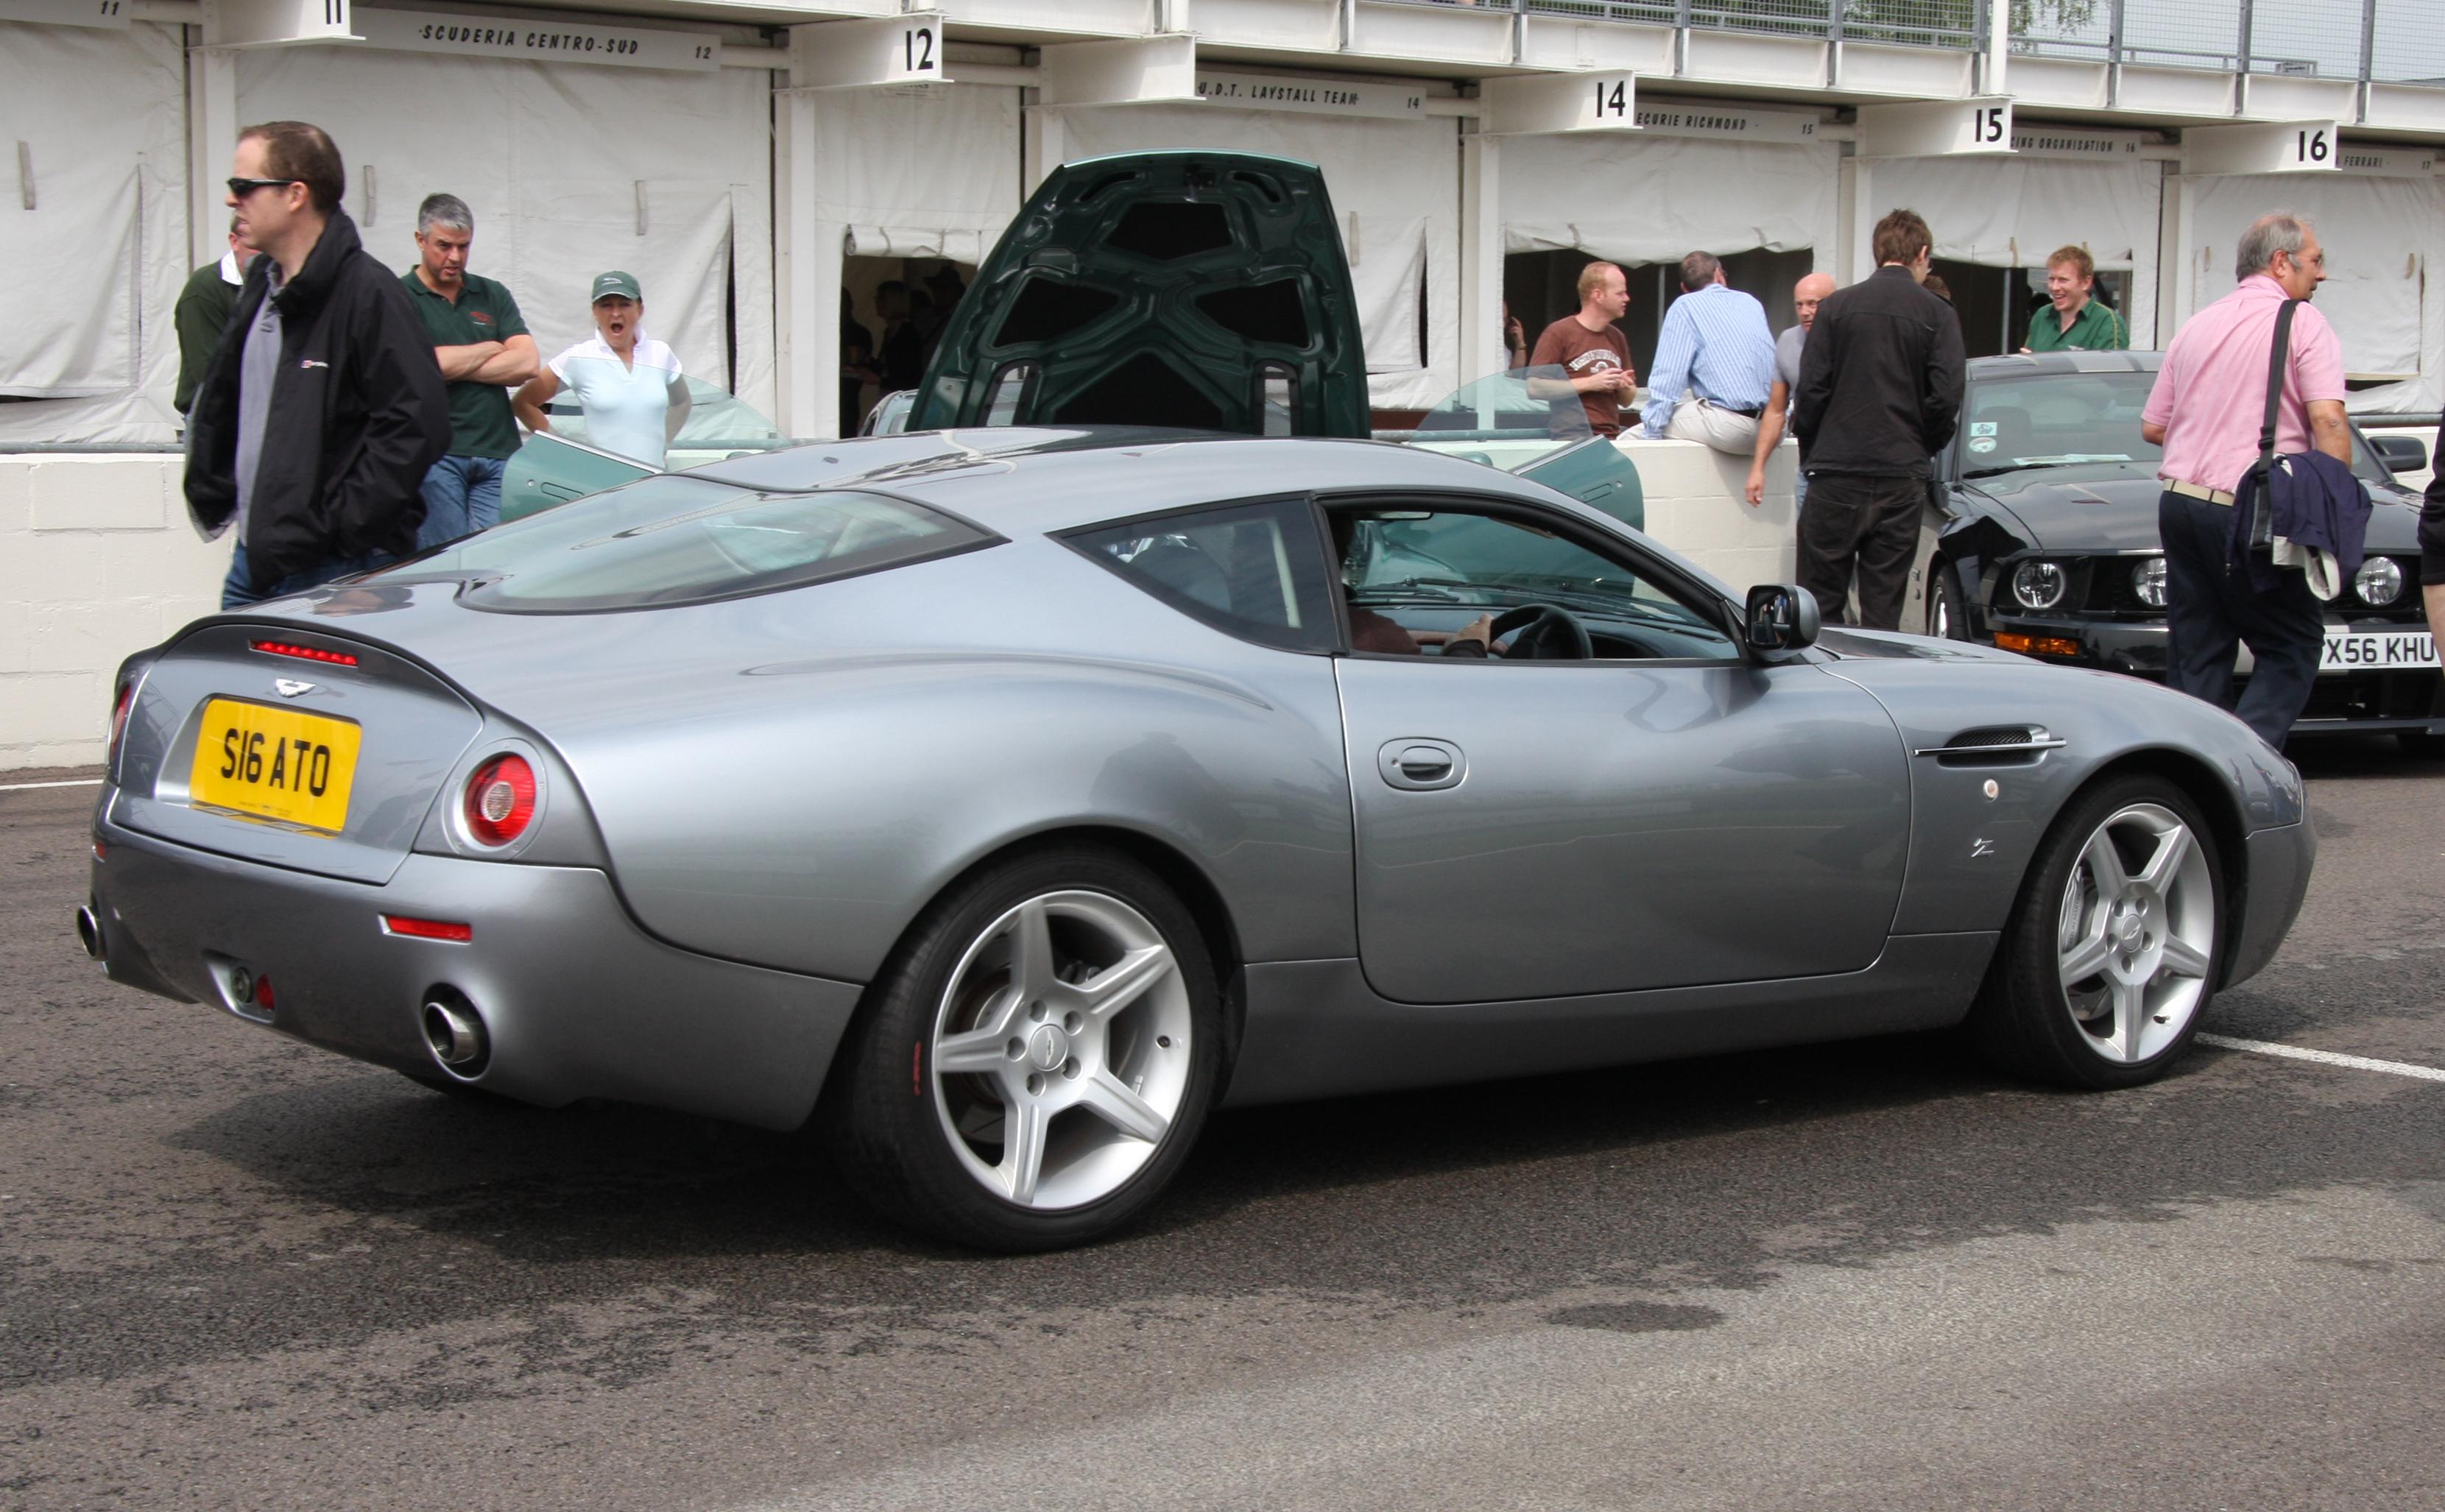 Aston_Martin_DB7_Zagato_-_Flickr_-_exfor